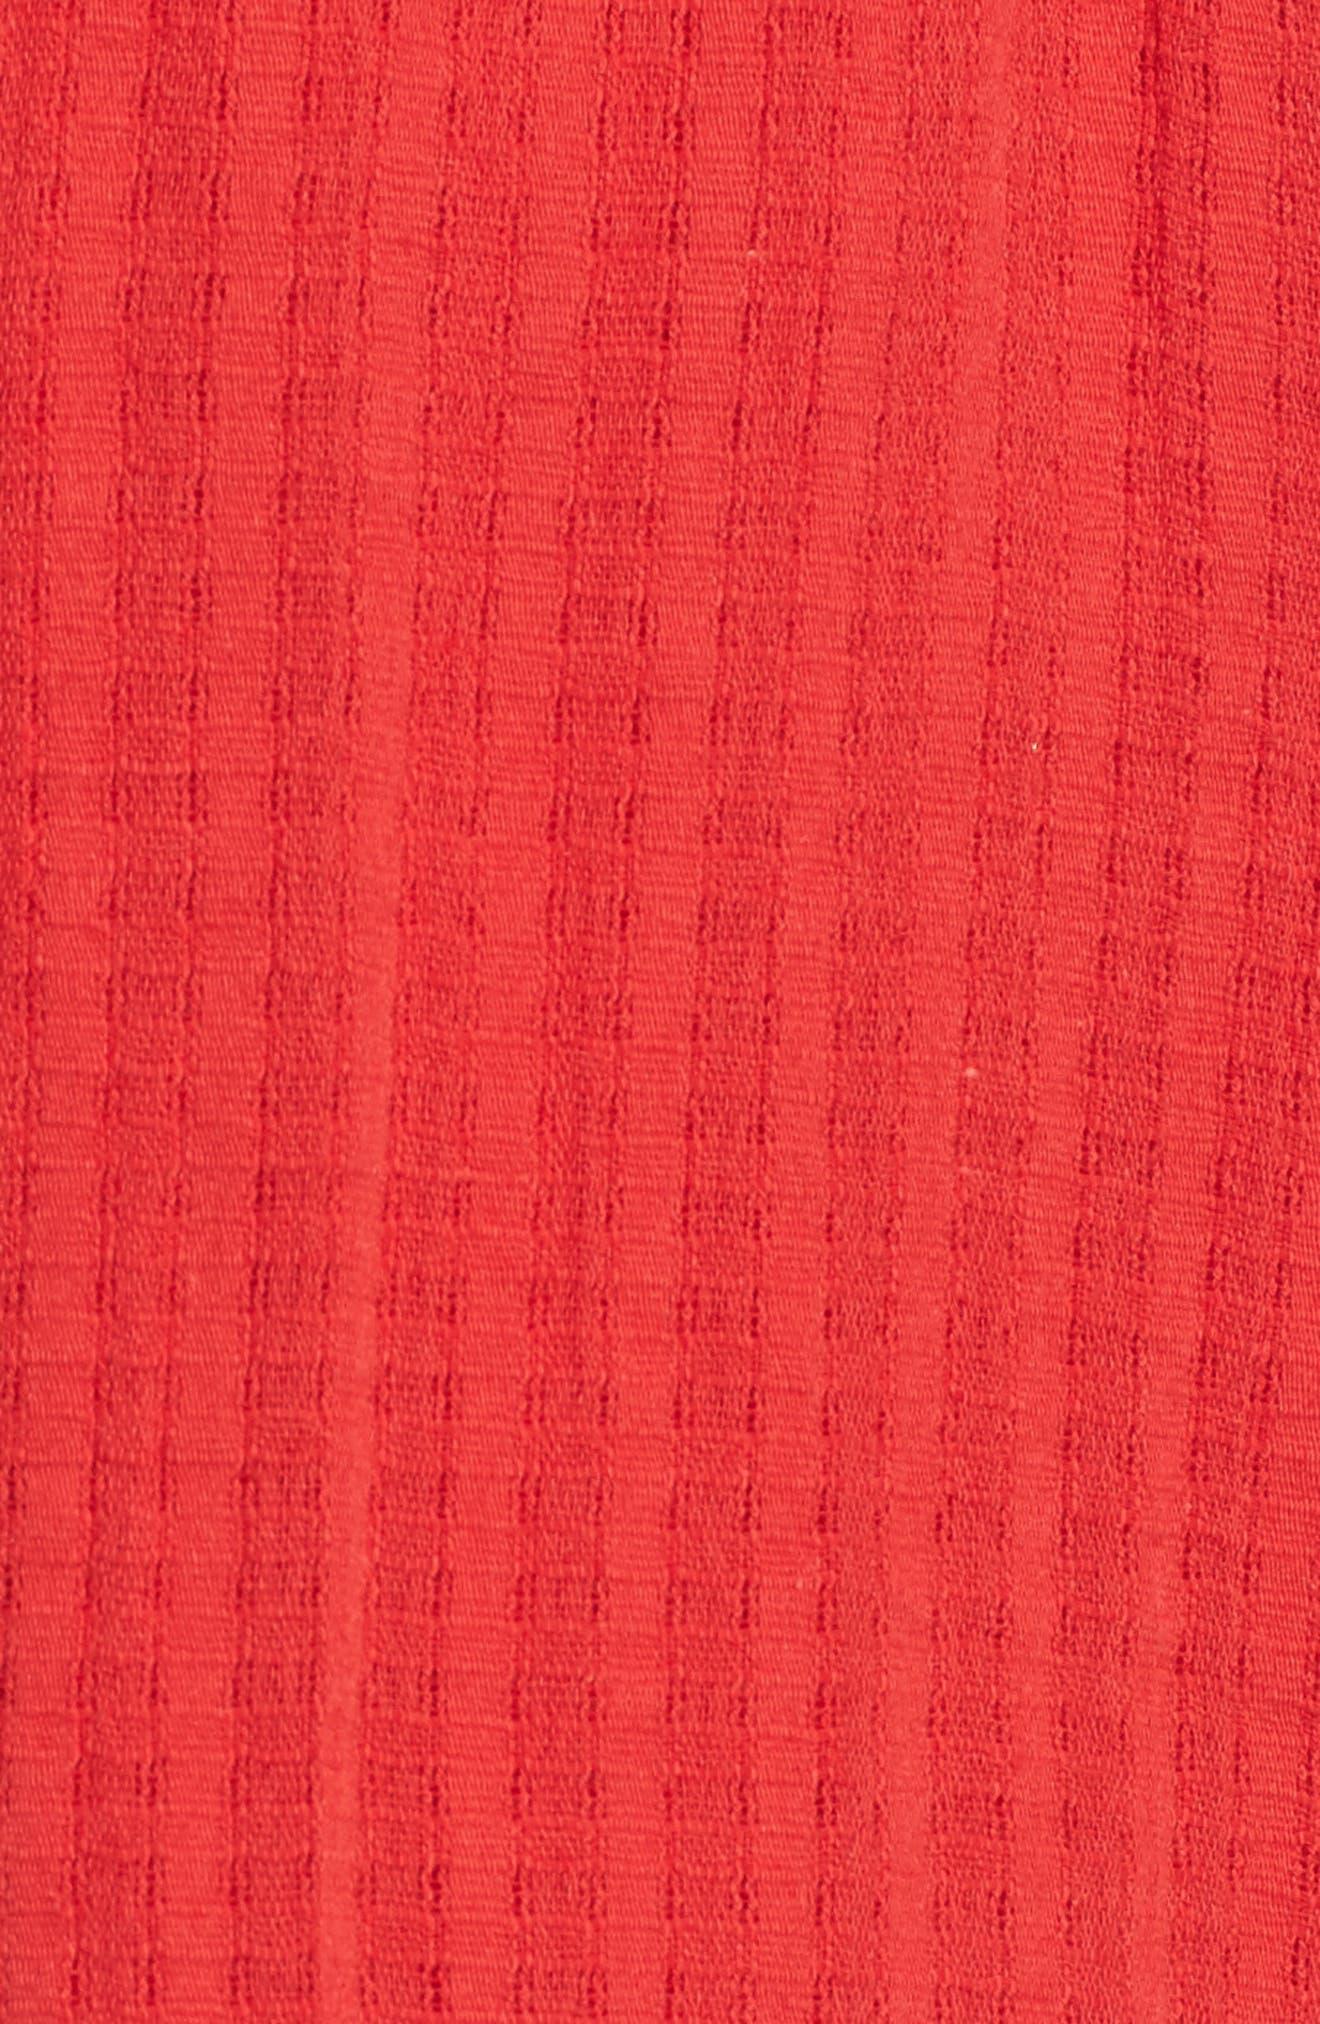 Pompom Trim Shorts,                             Alternate thumbnail 5, color,                             RED